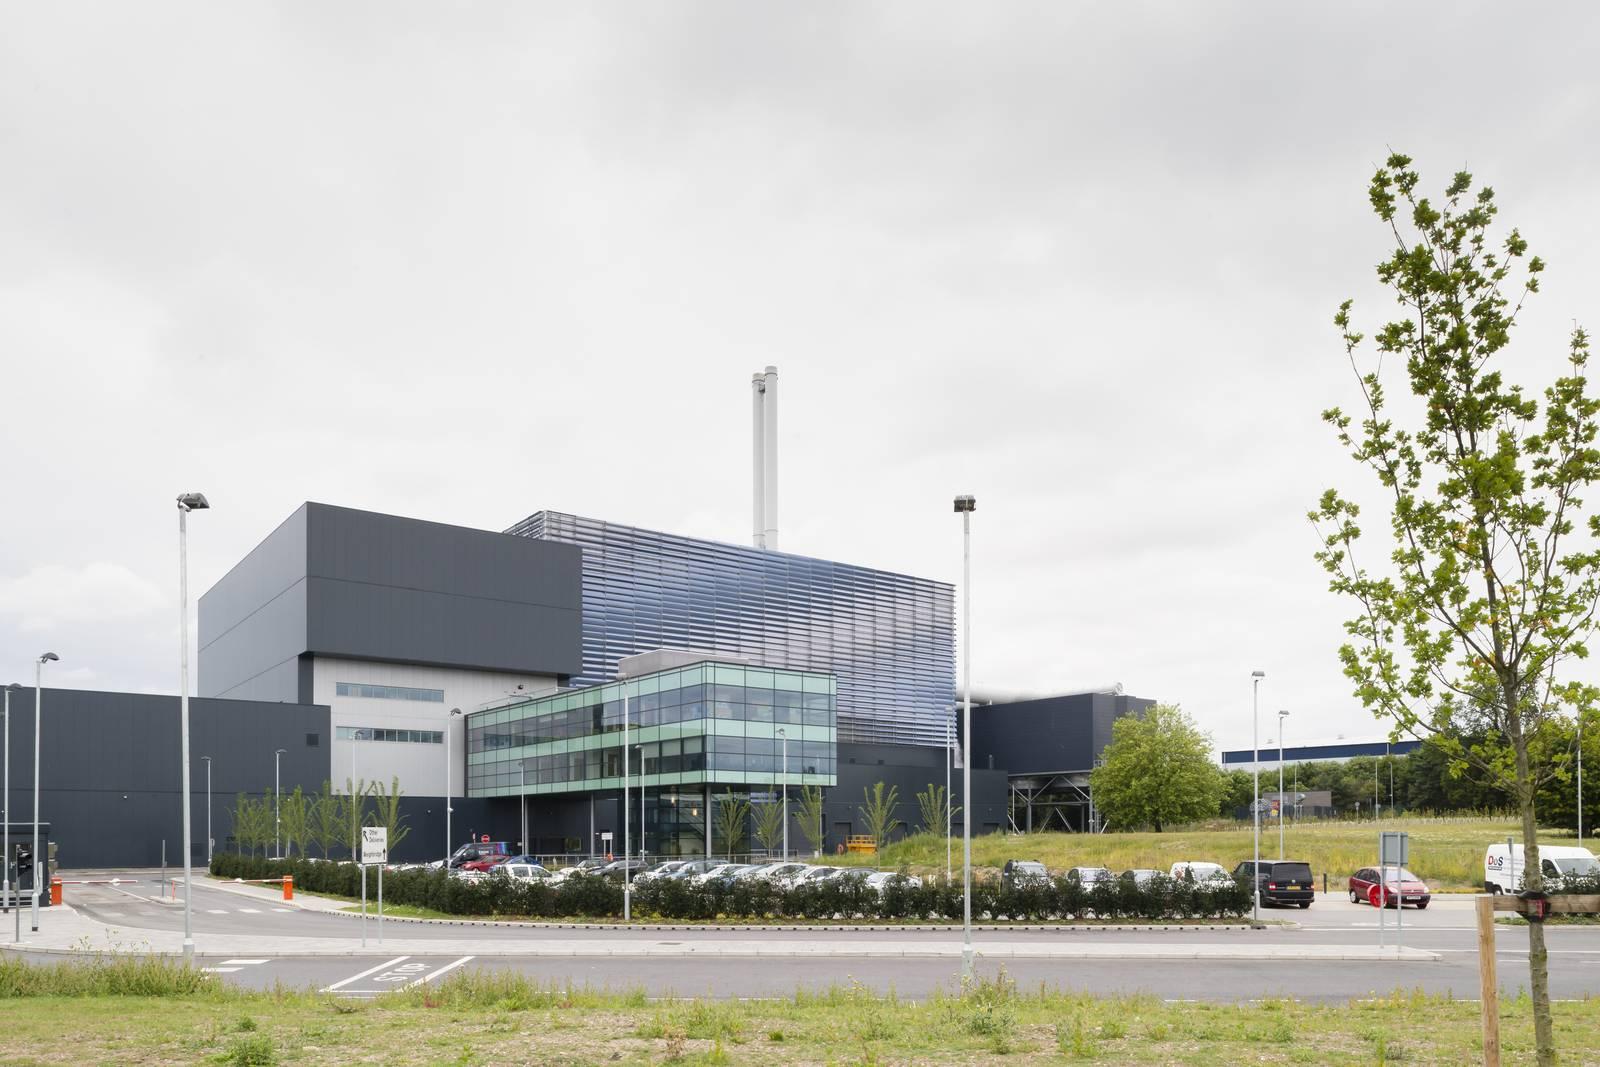 Suez energy from waste facility - Grimshaw Architects